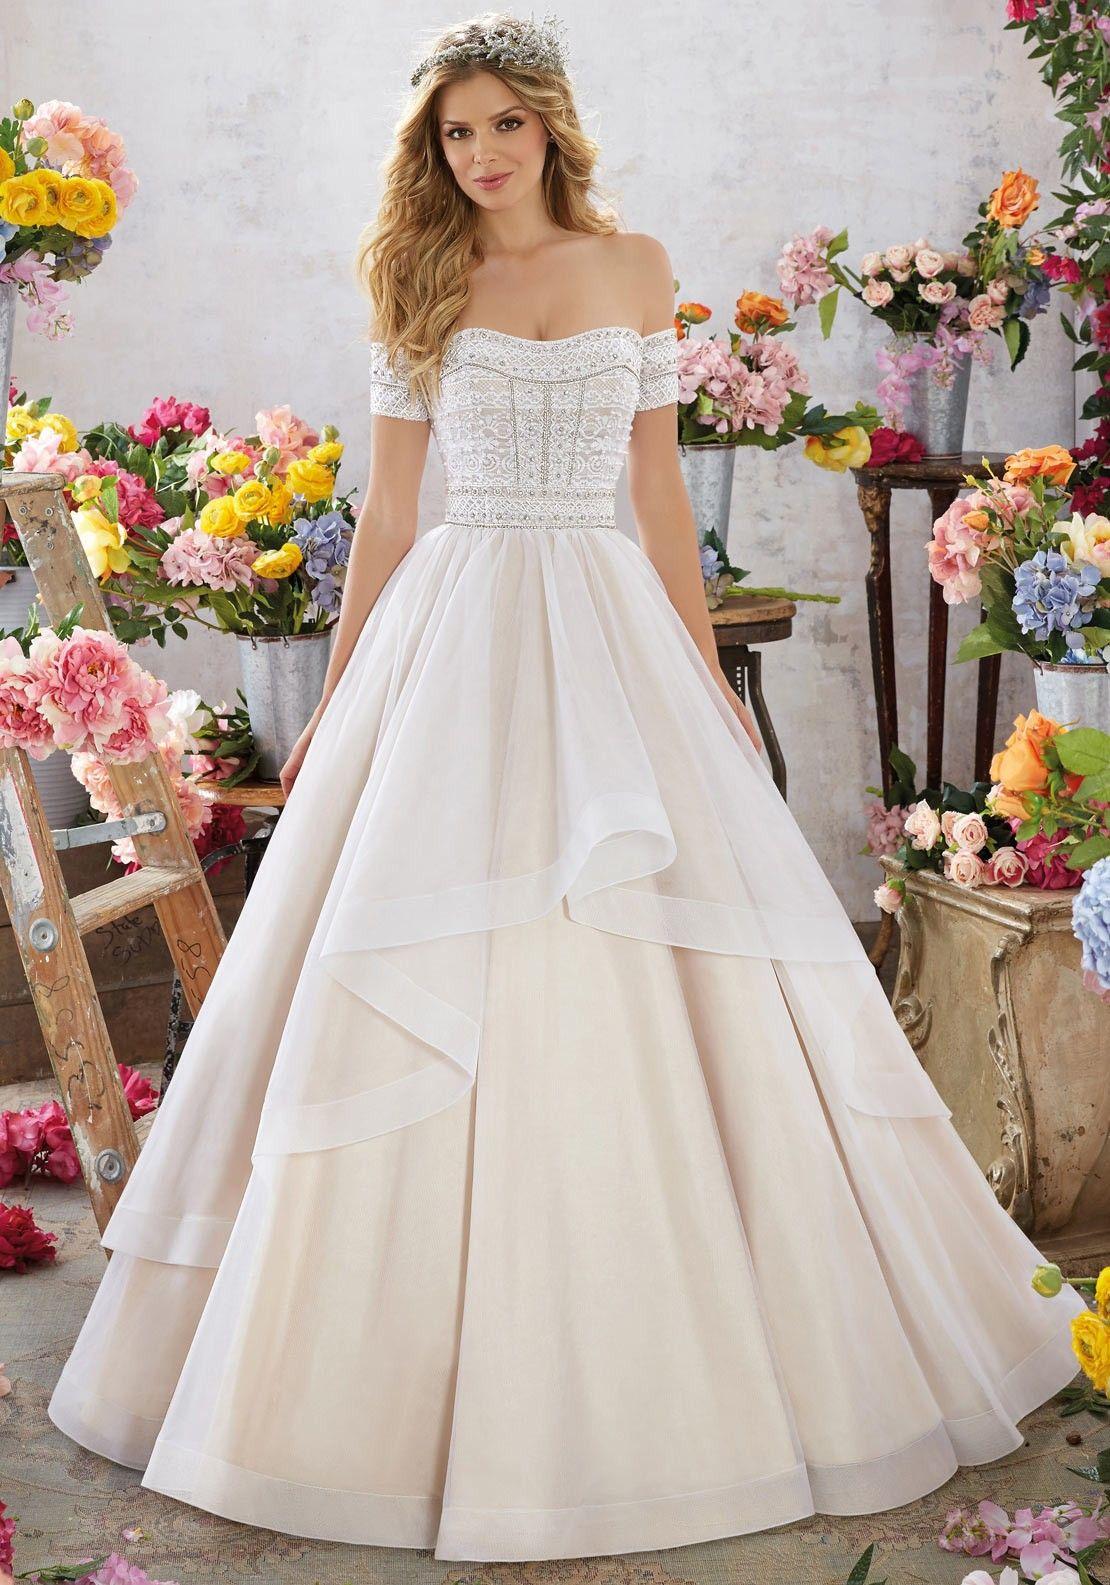 Mori lee wedding dress wedding dresses pinterest mori lee